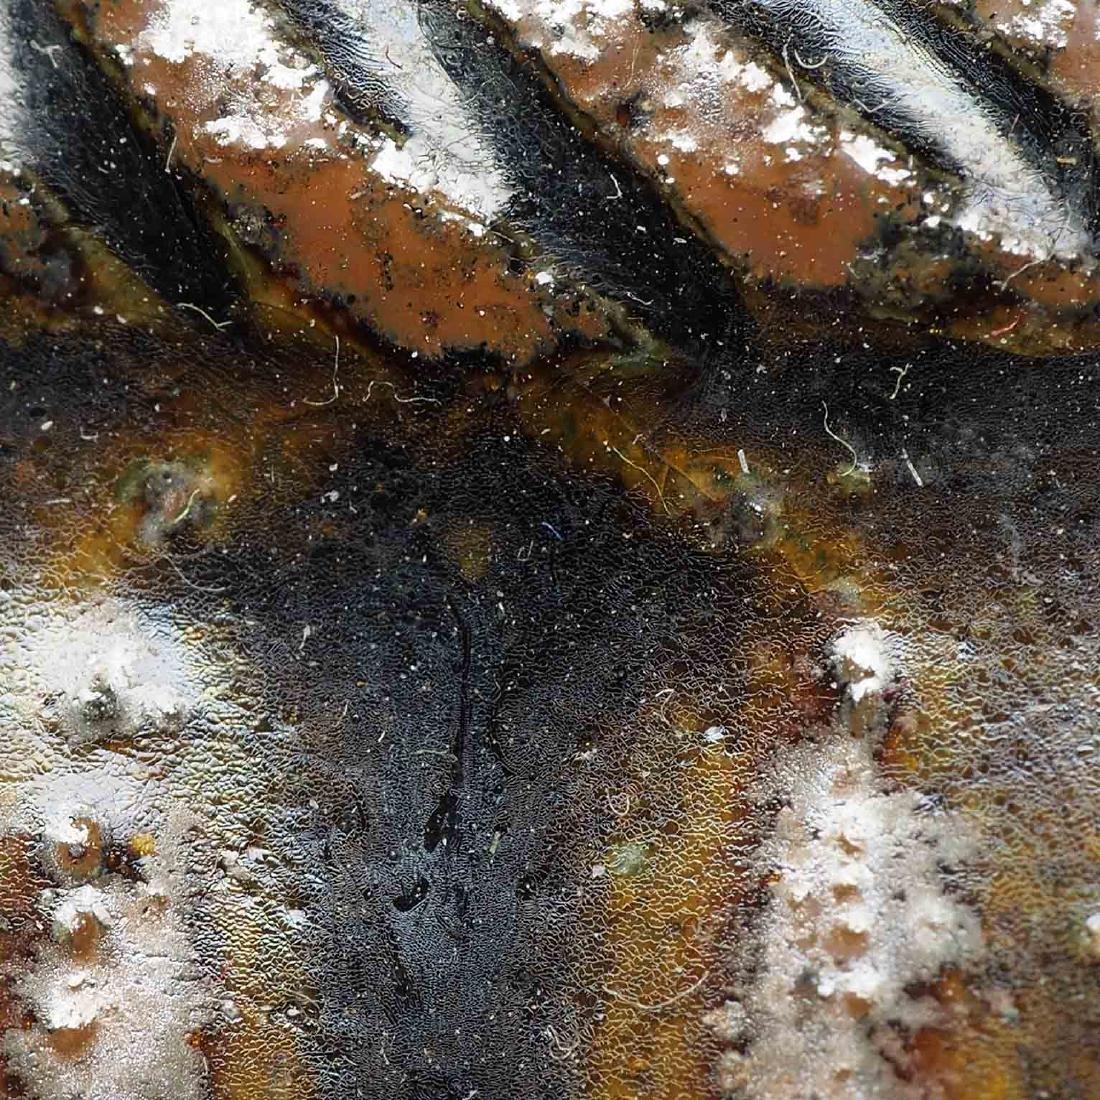 Black glazed Arabic Style Ewer with Lid, Song Dynasty - 9